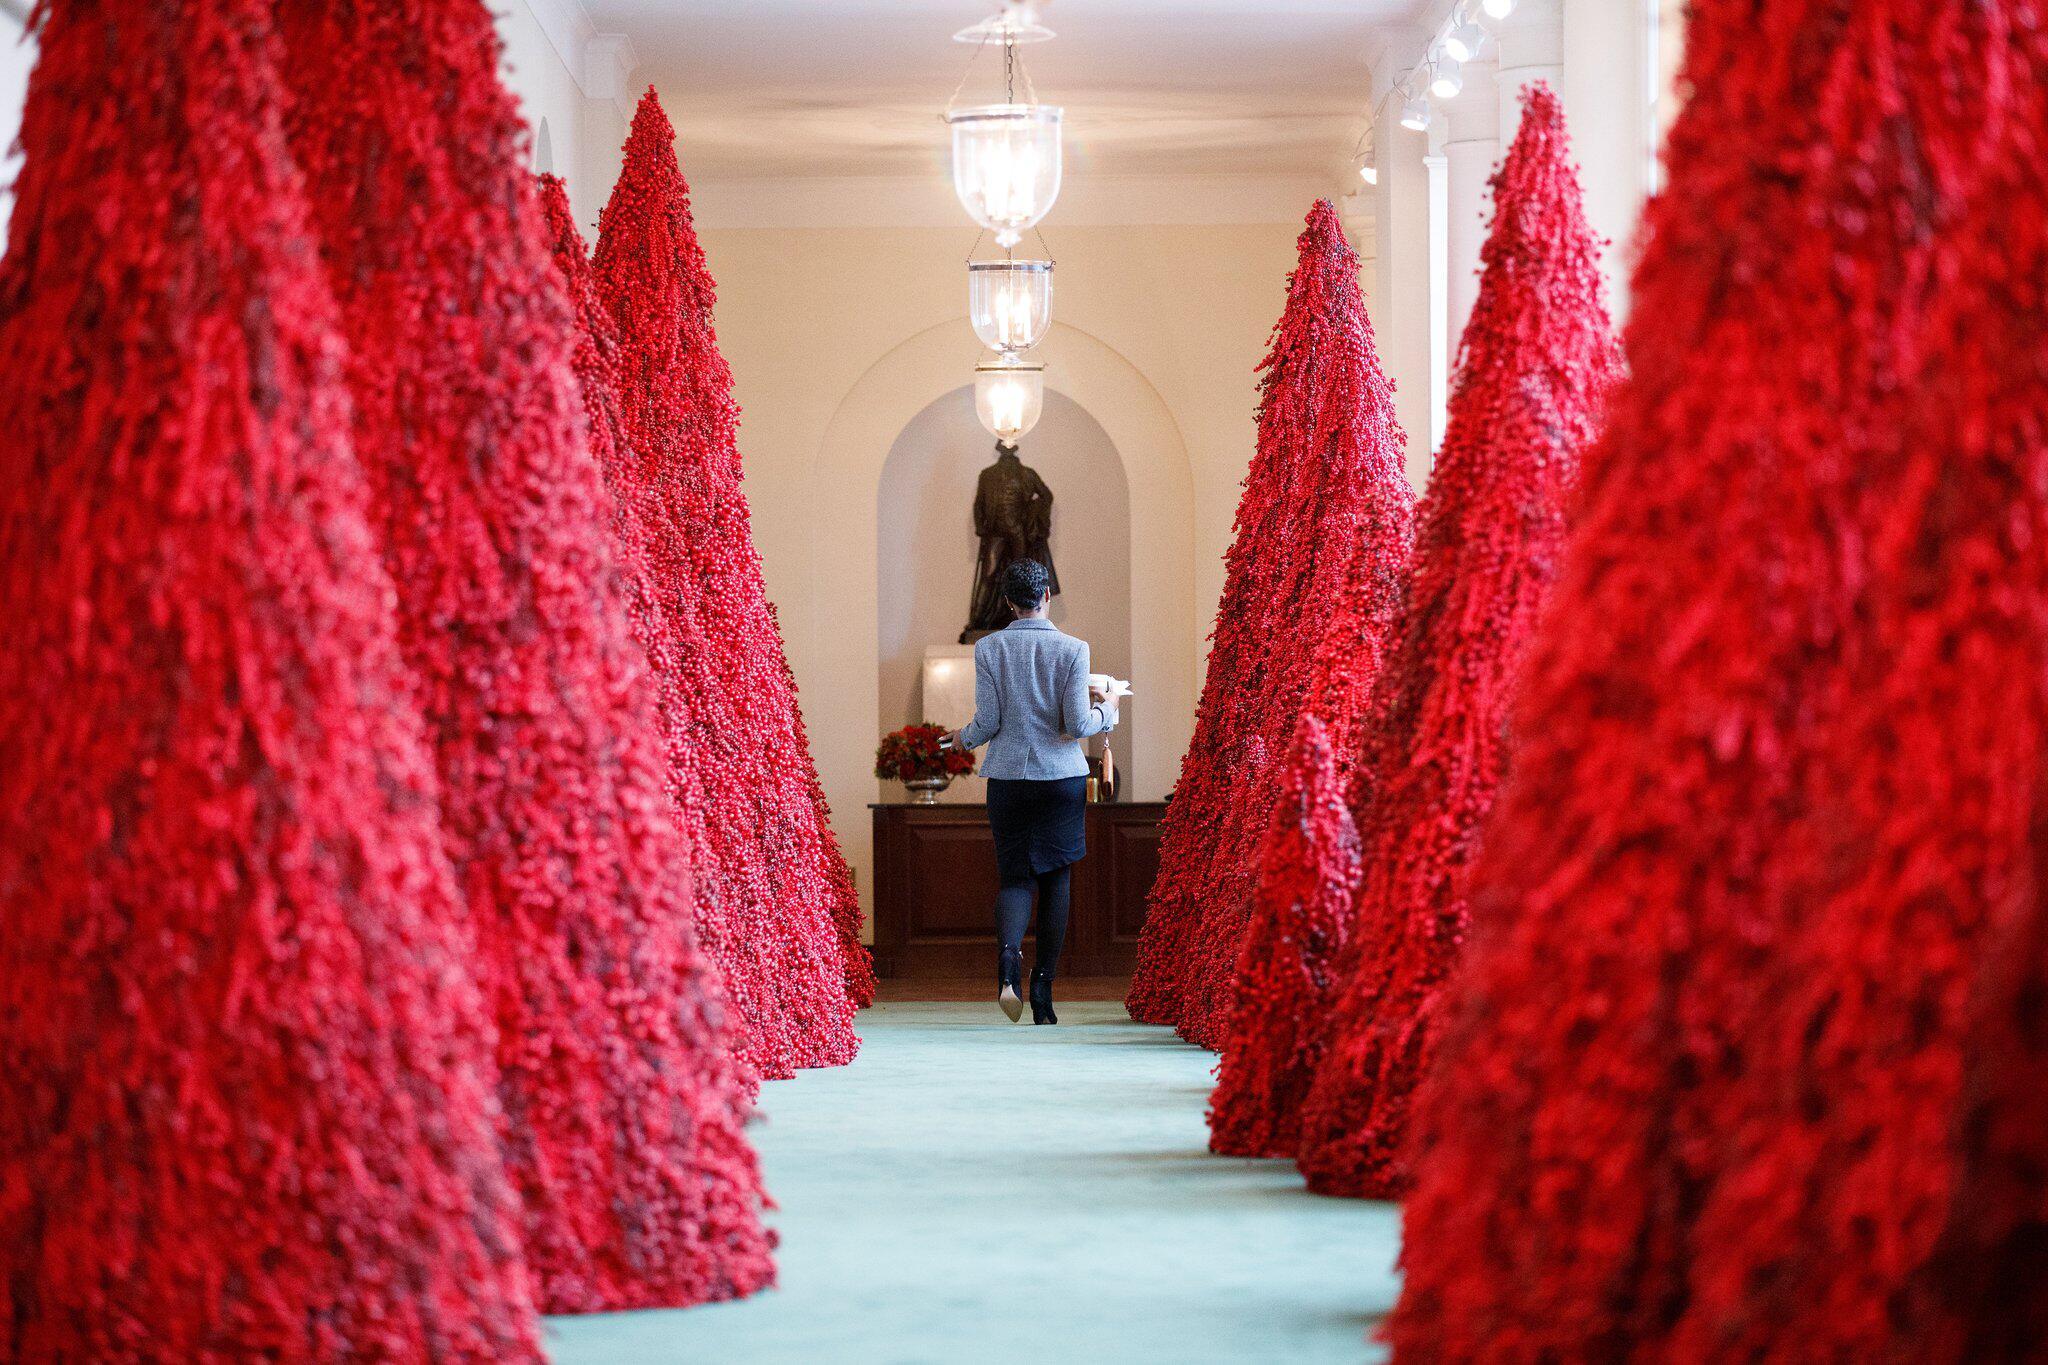 melania trump enth llt weihnachtsdekoration im wei en haus web de. Black Bedroom Furniture Sets. Home Design Ideas